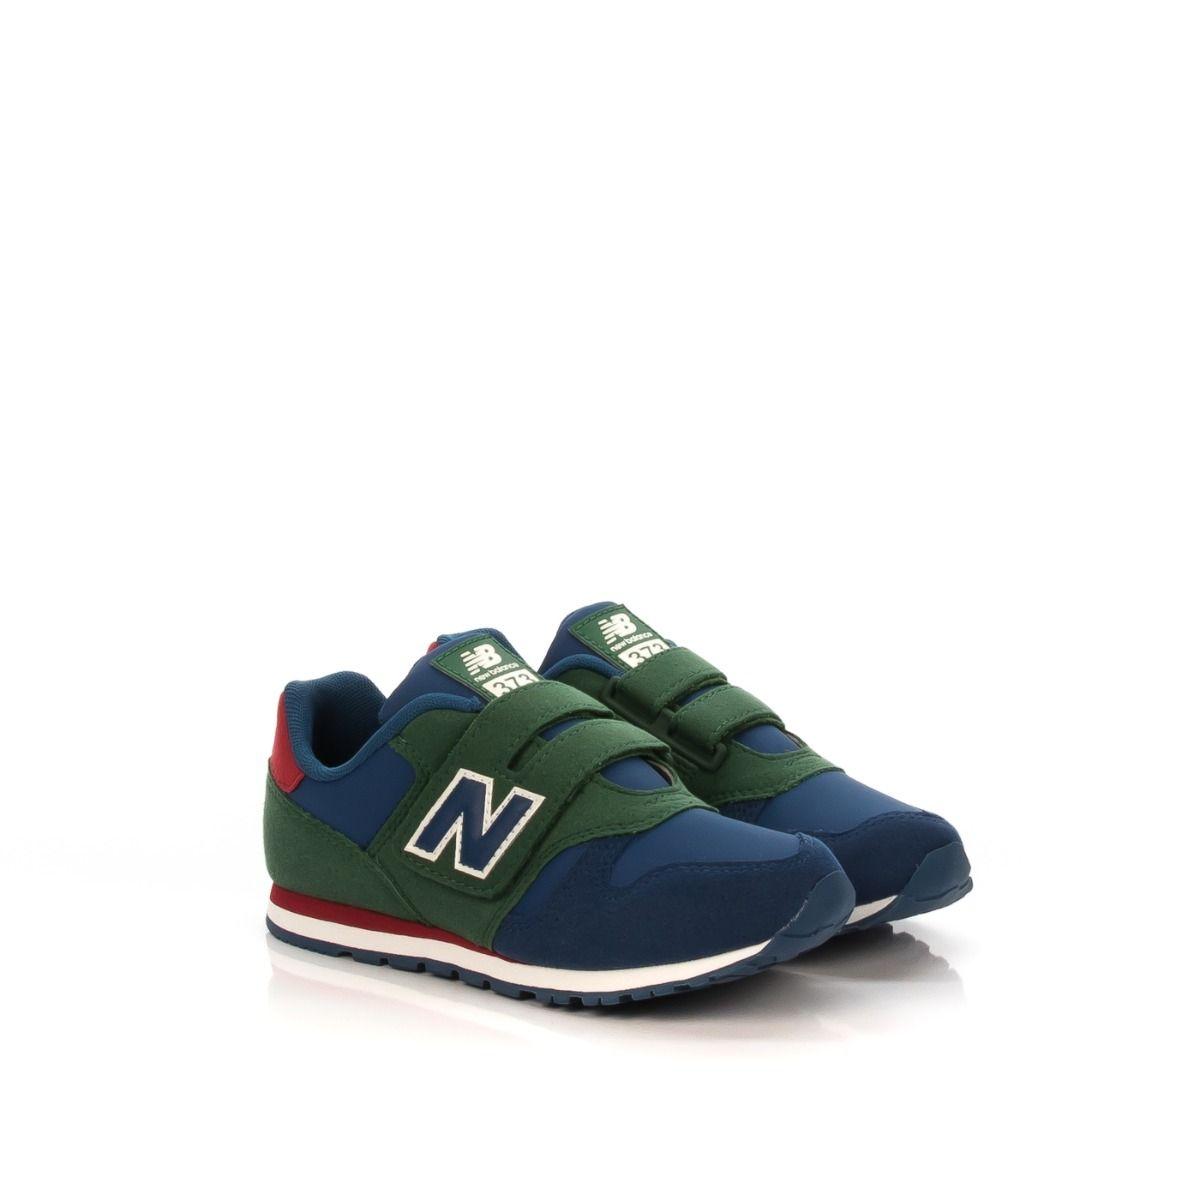 new balance verde e blu